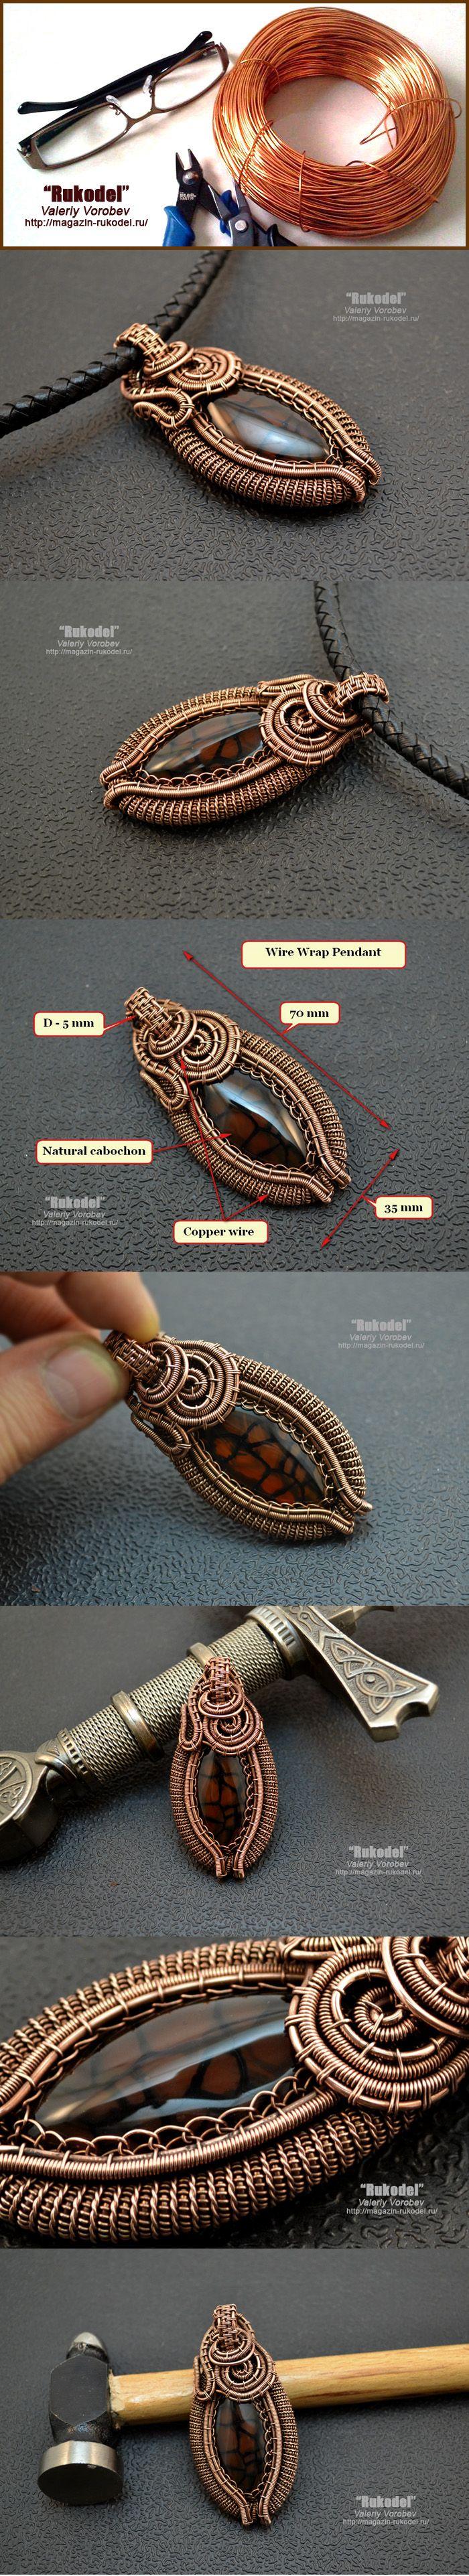 105 best Wire Wrap Tutorials images on Pinterest | Jewelry ideas ...